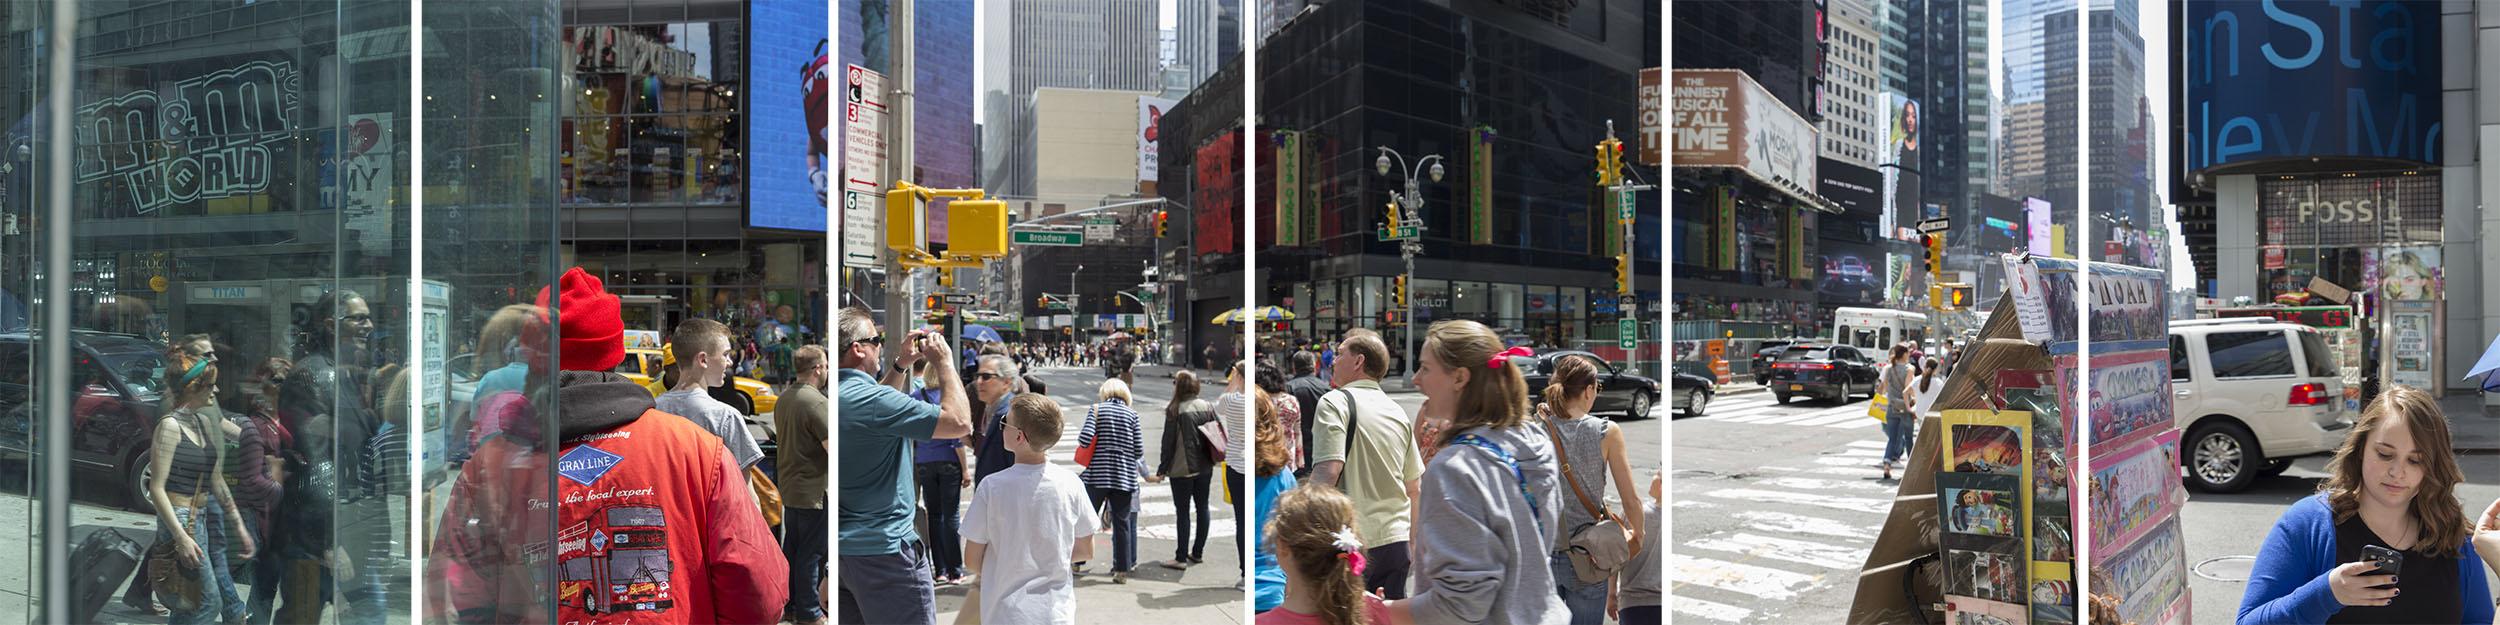 New York, Manhattan,4-18-2015, 5962-5982